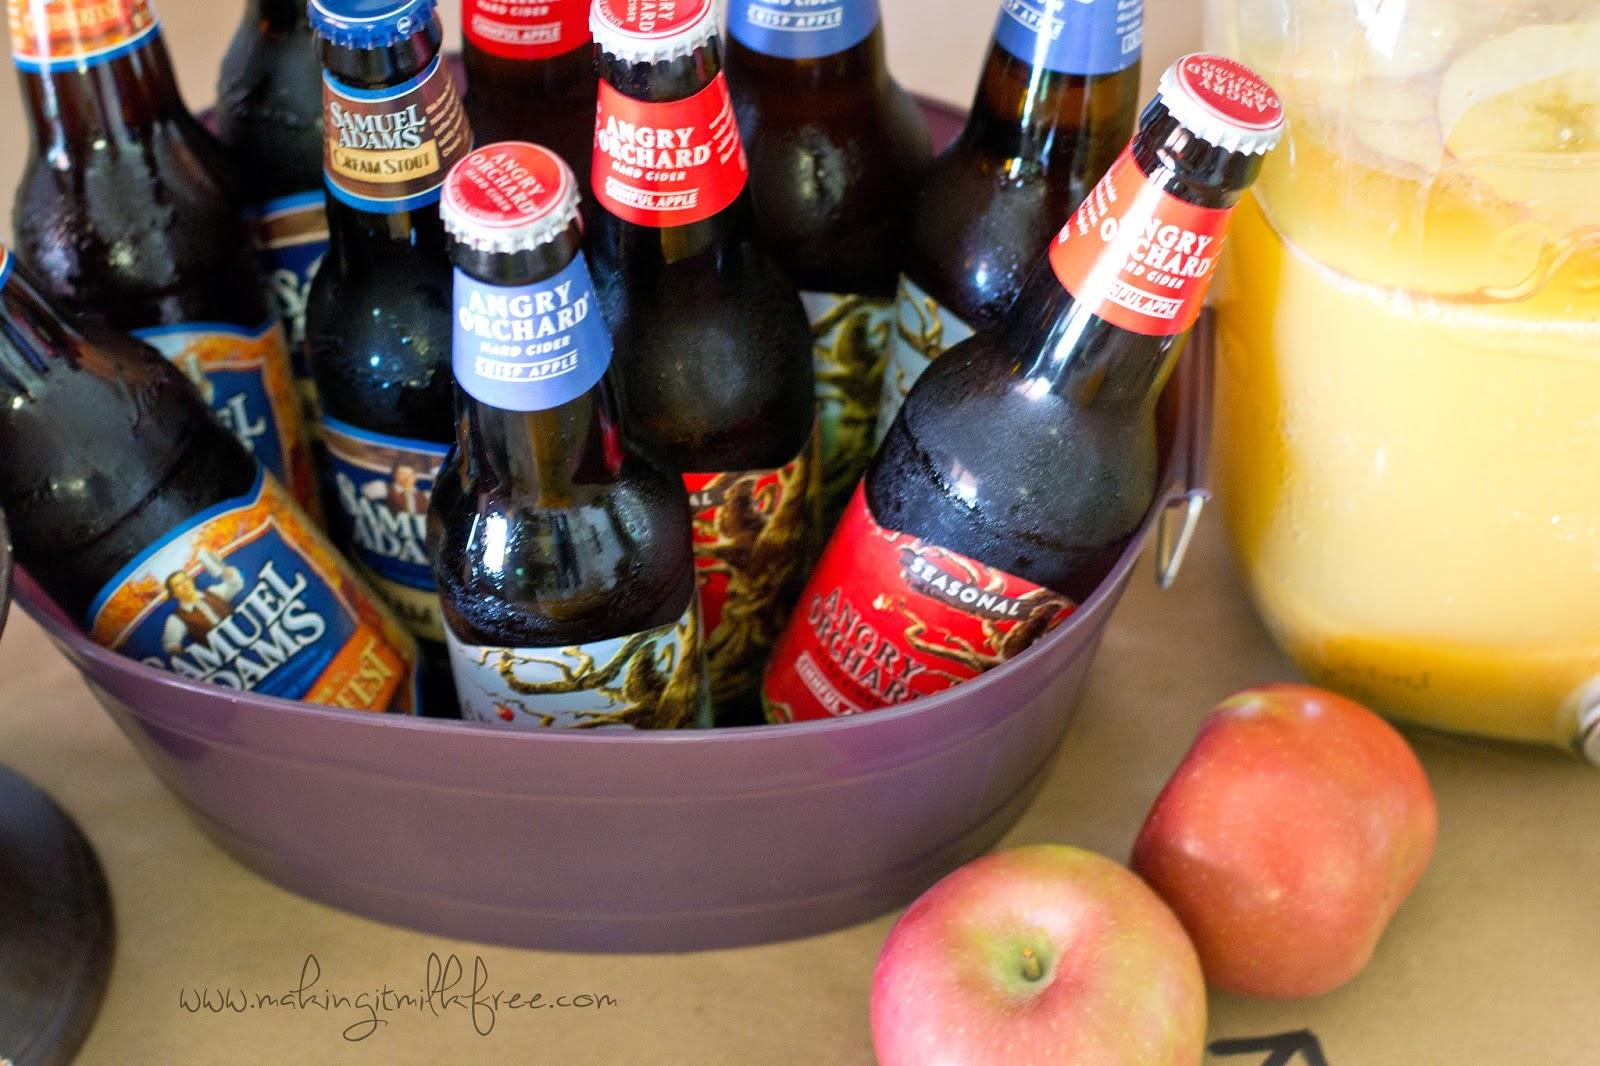 #angryorchard #hardcider #samadams #oktoberfest